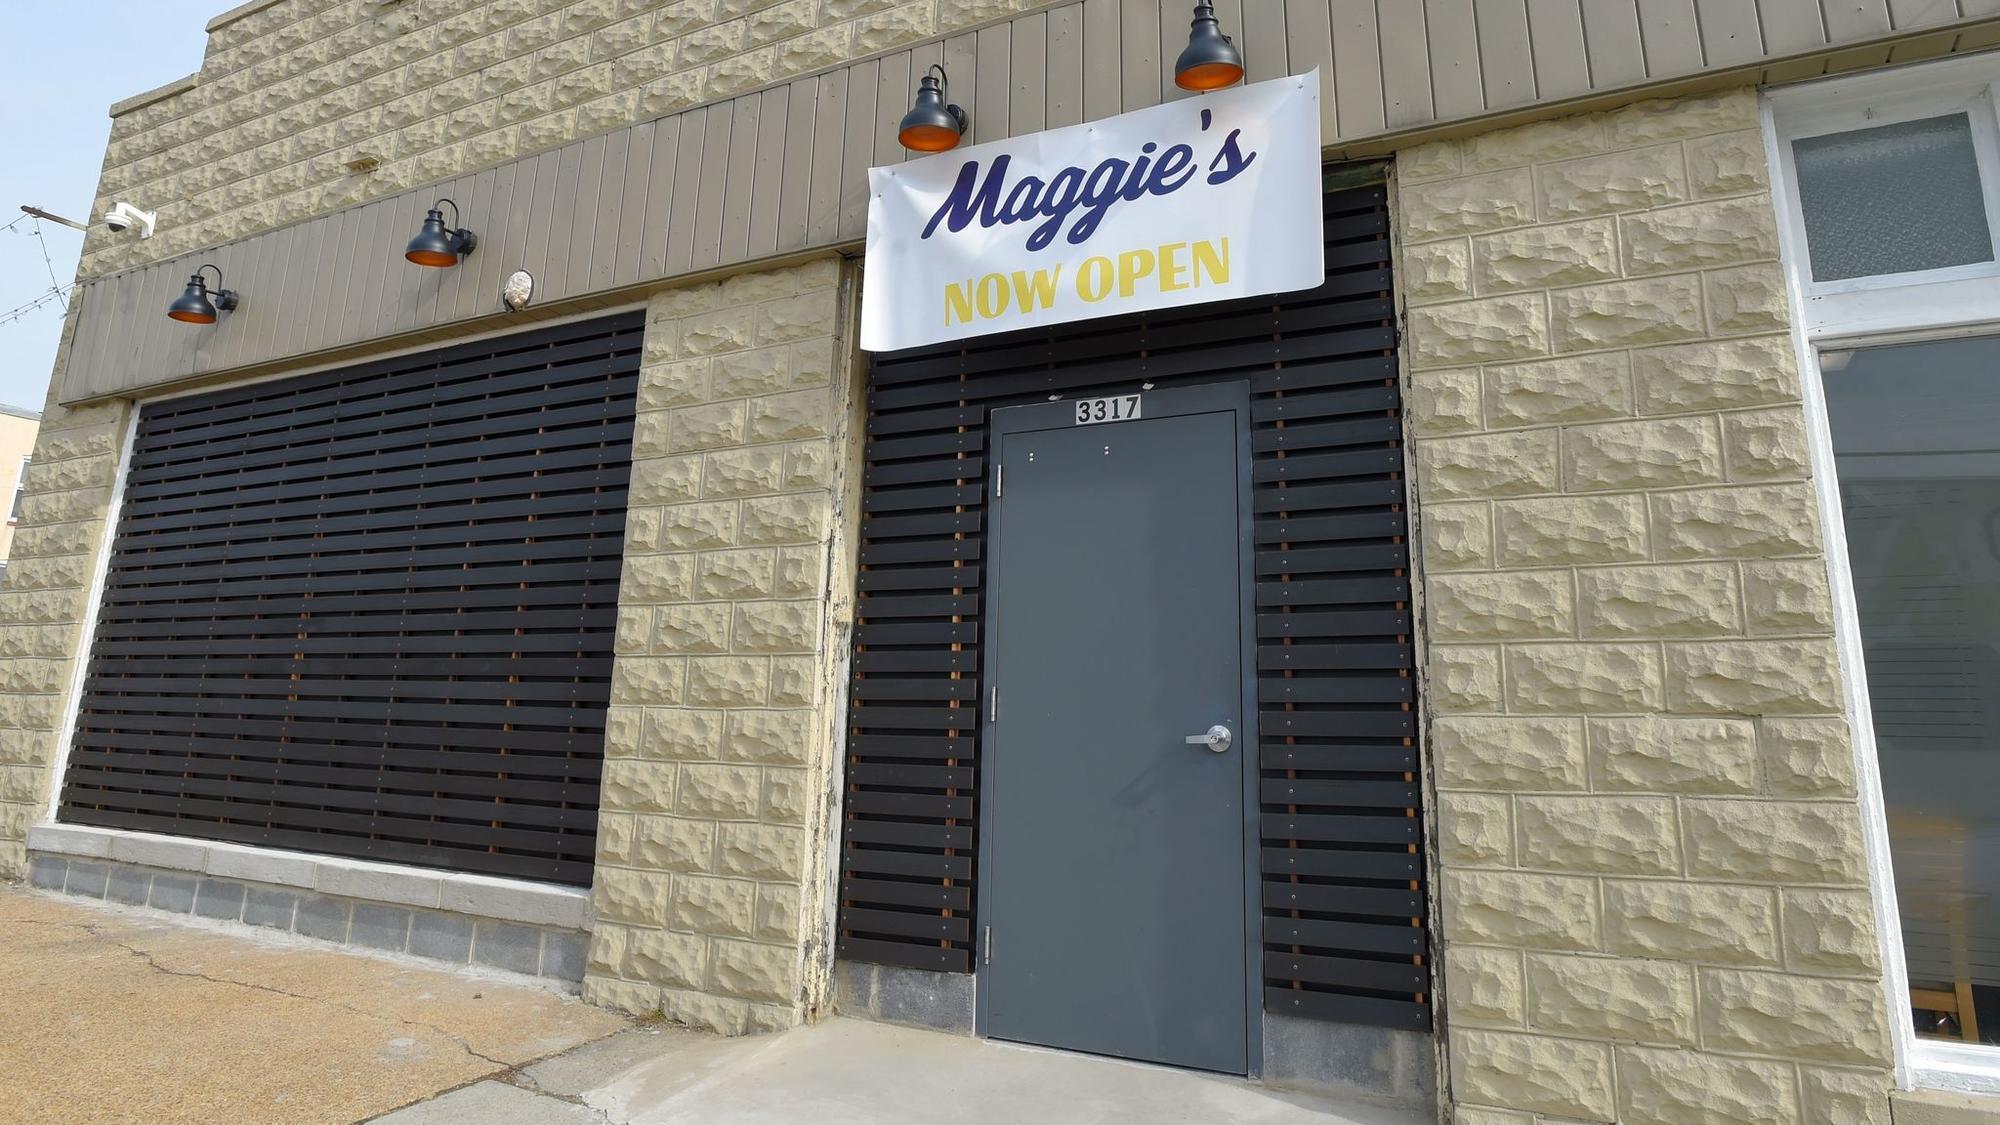 Pair of medical marijuana dispensaries open in Baltimore with little fanfare